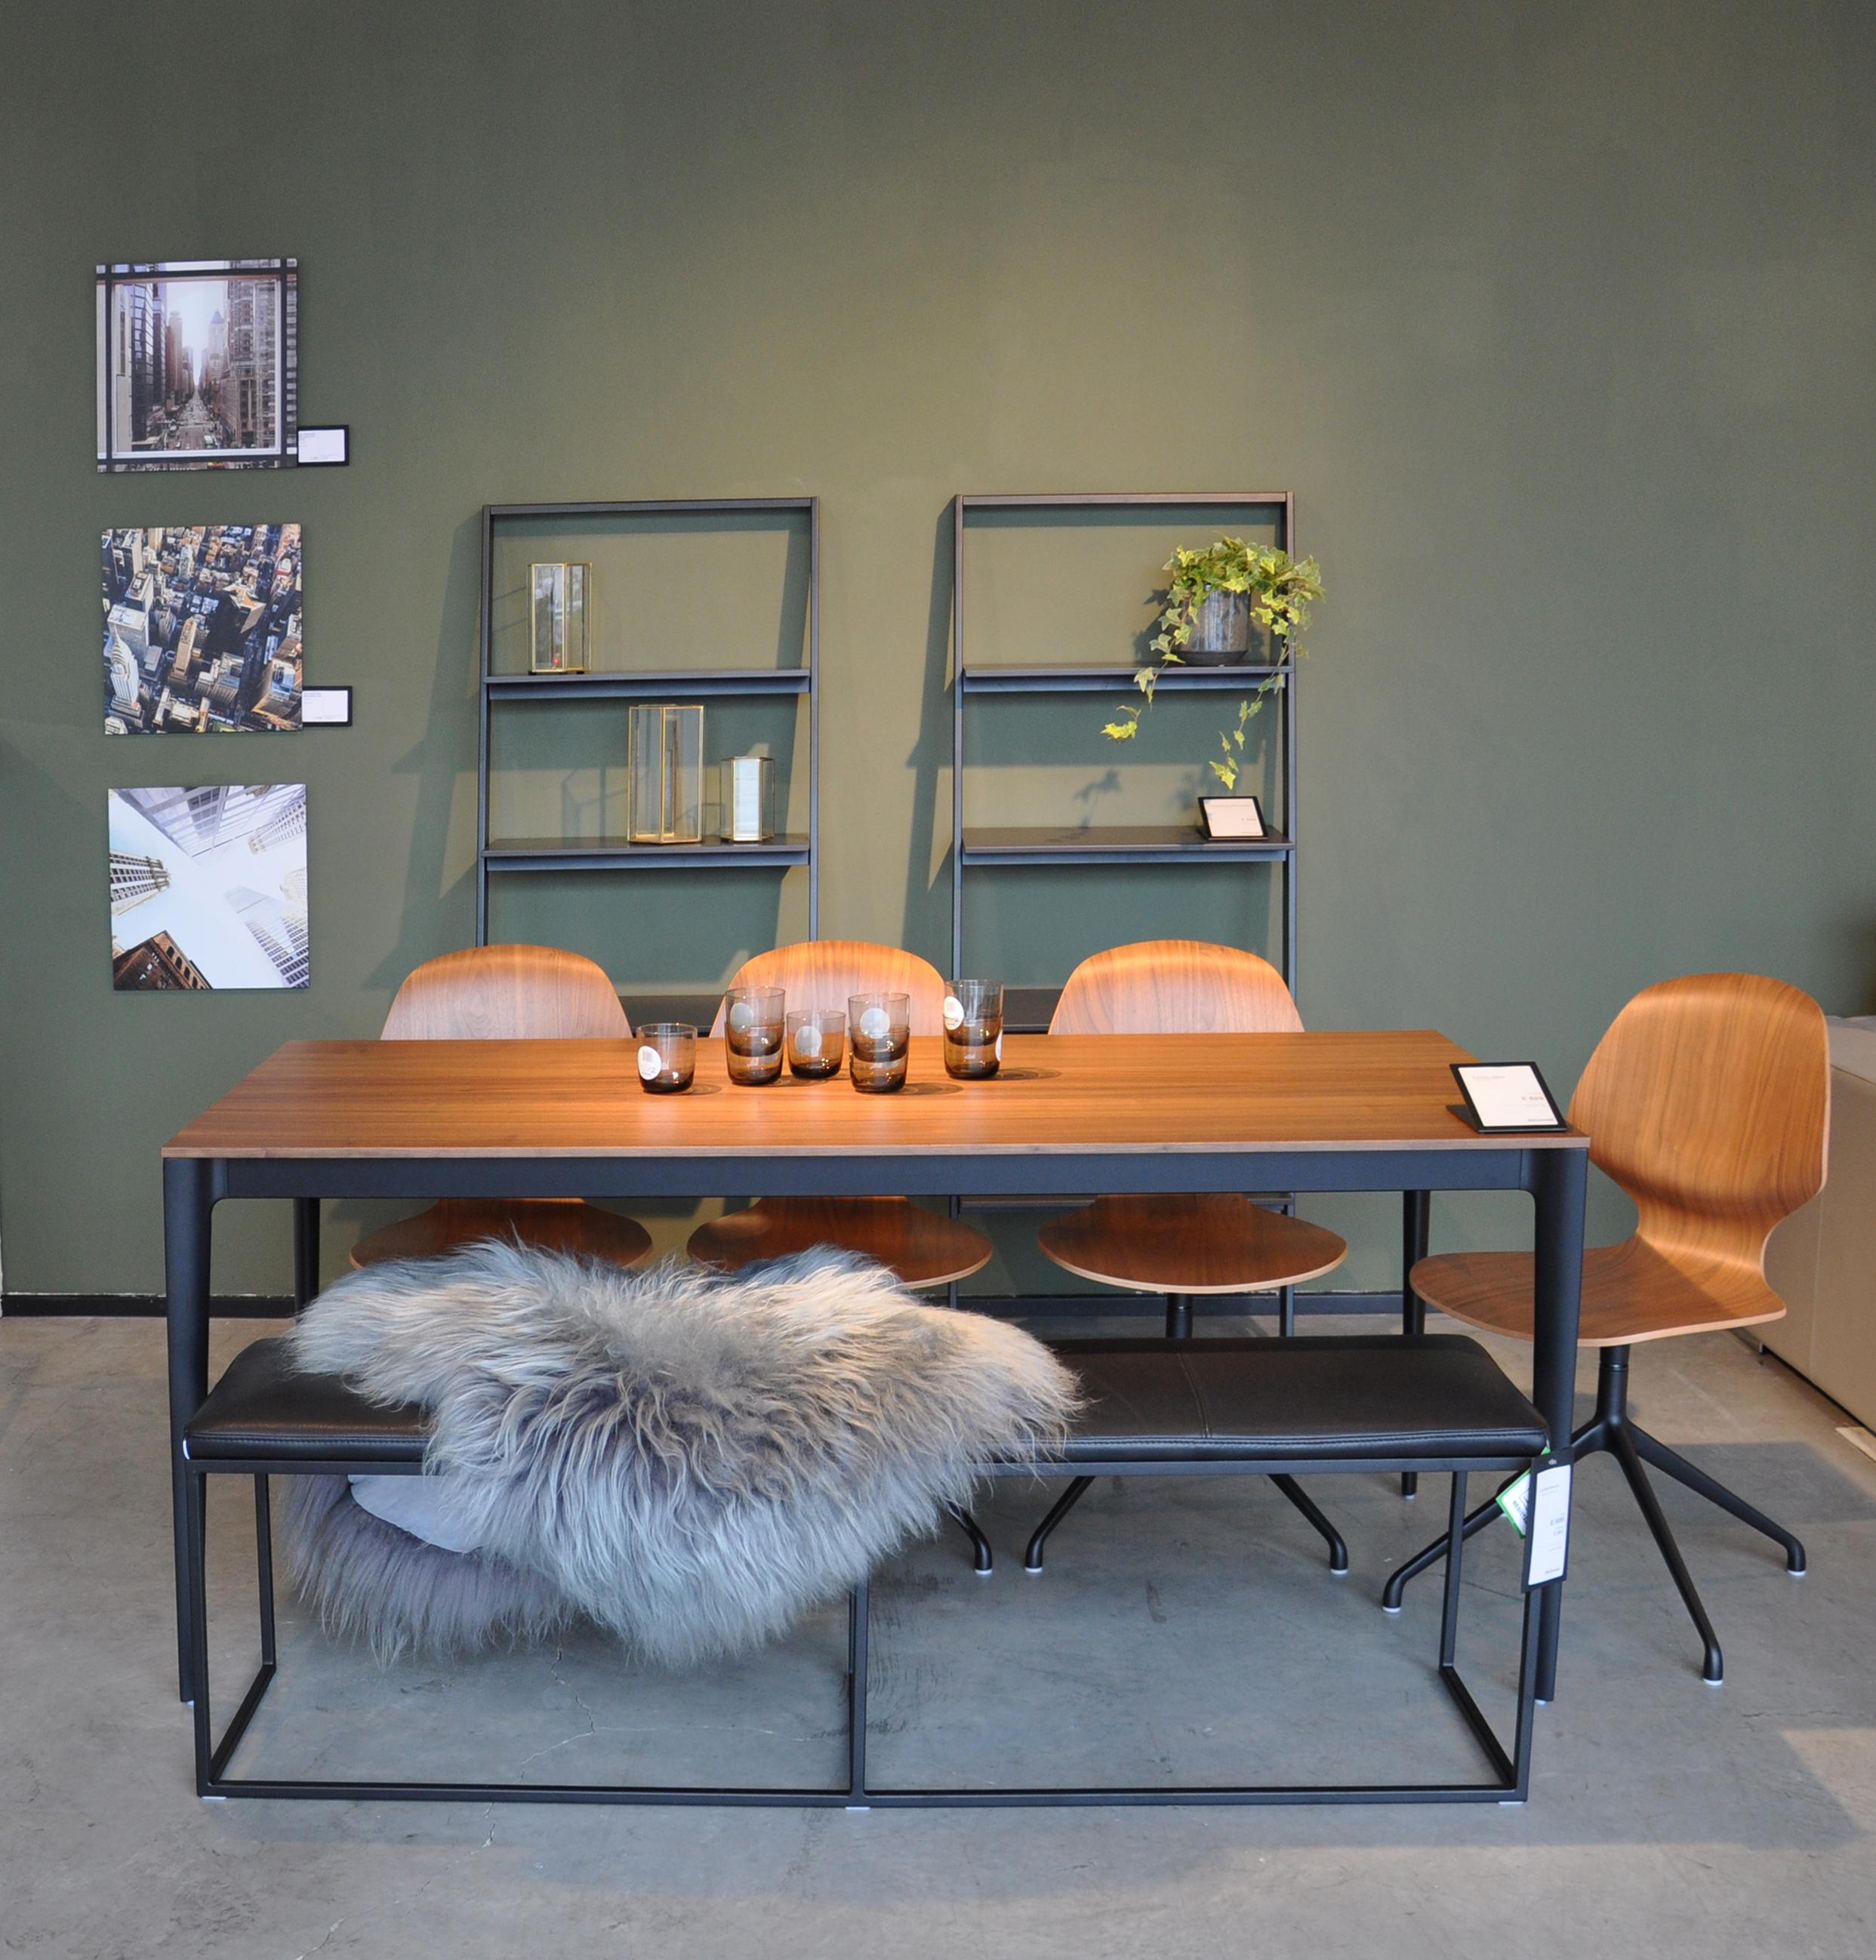 Sheepskin ,  Torrino table ,  Florence chairs ,  Hexagon lanterns  on  Bordeaux shelving units .